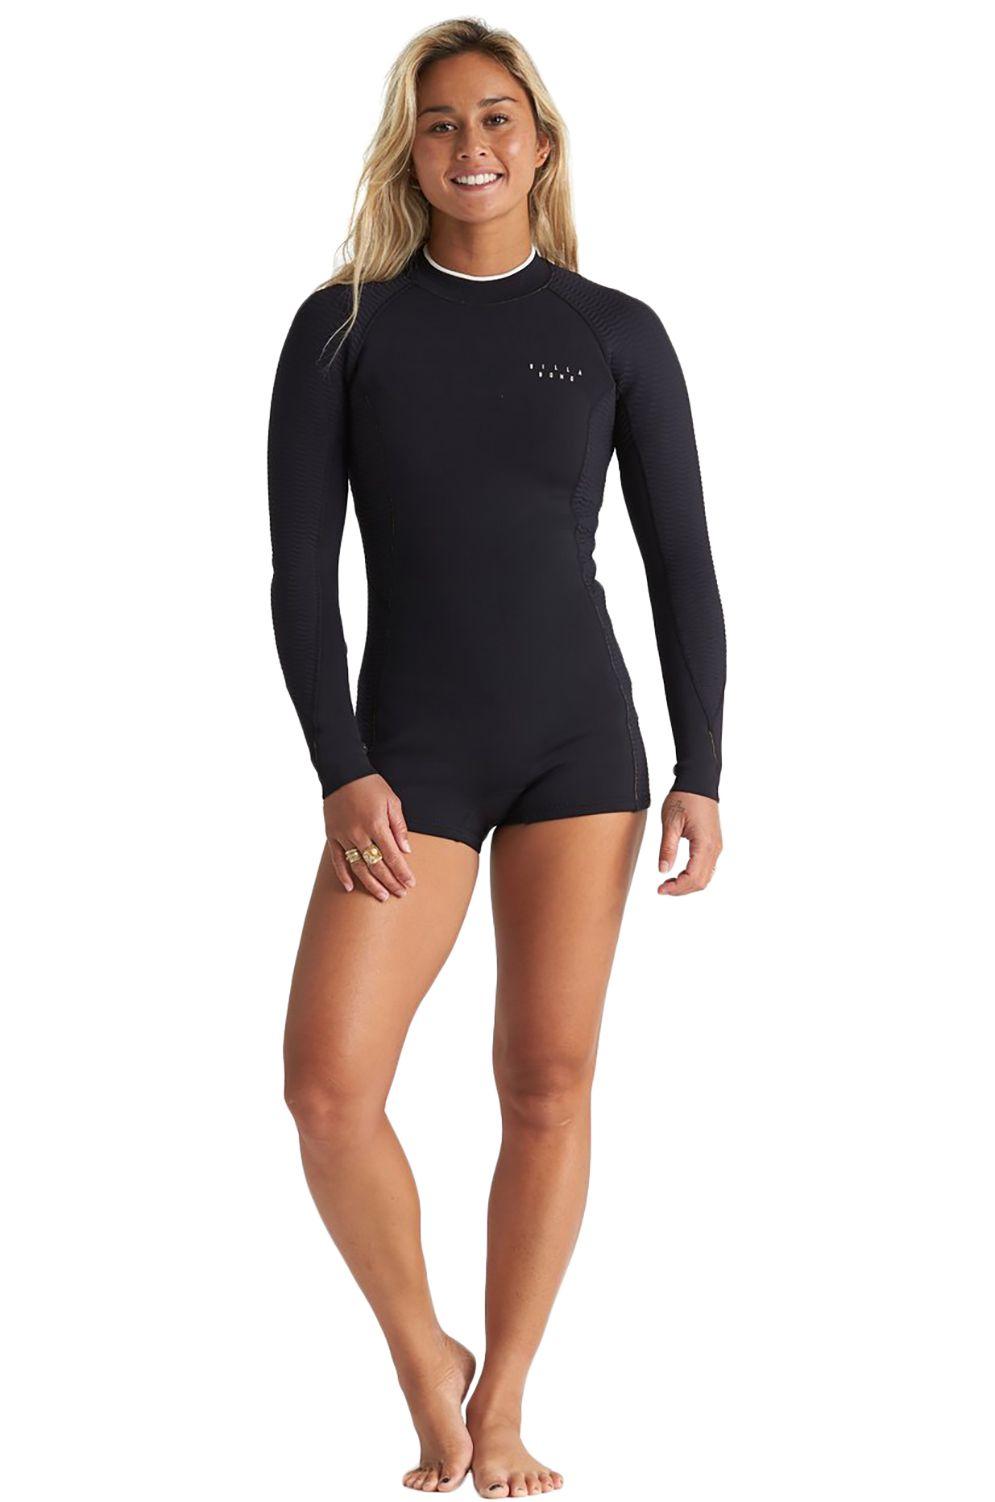 Billabong Wetsuit E SPRING FEVER SURF CAPSULE Onyx